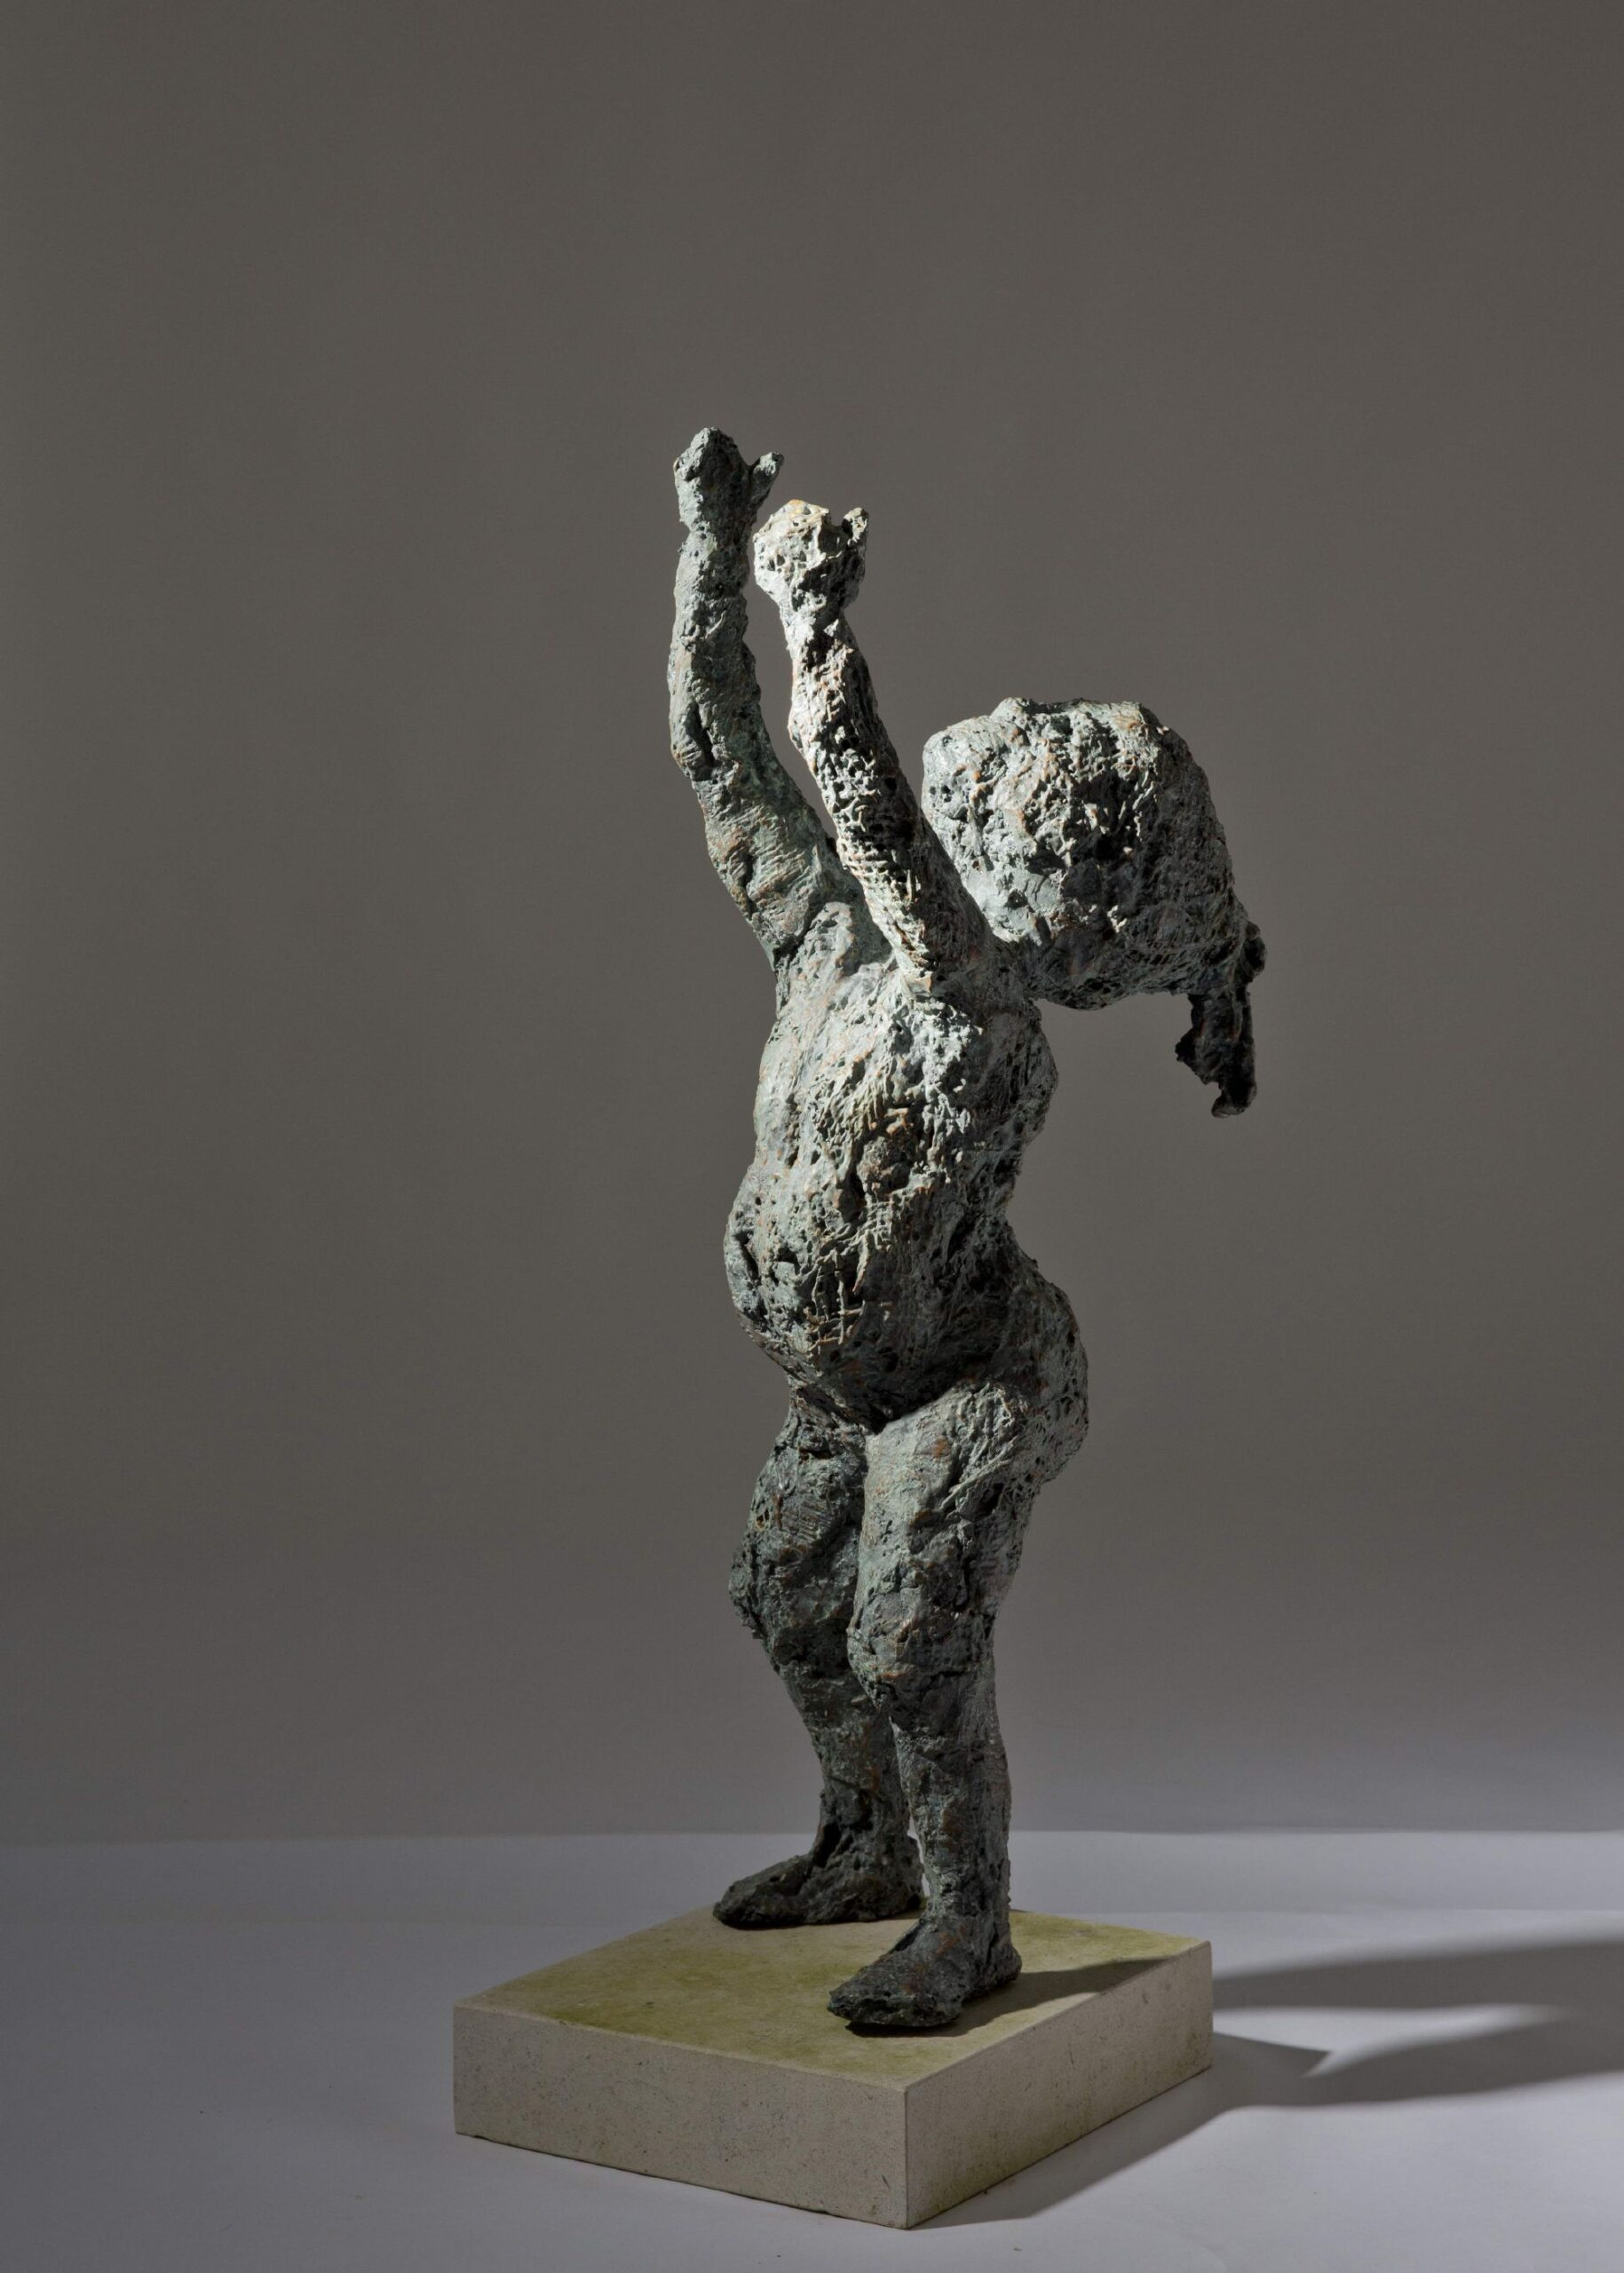 Sculpture - Bronze - Figurative - Garden Standing Child 1